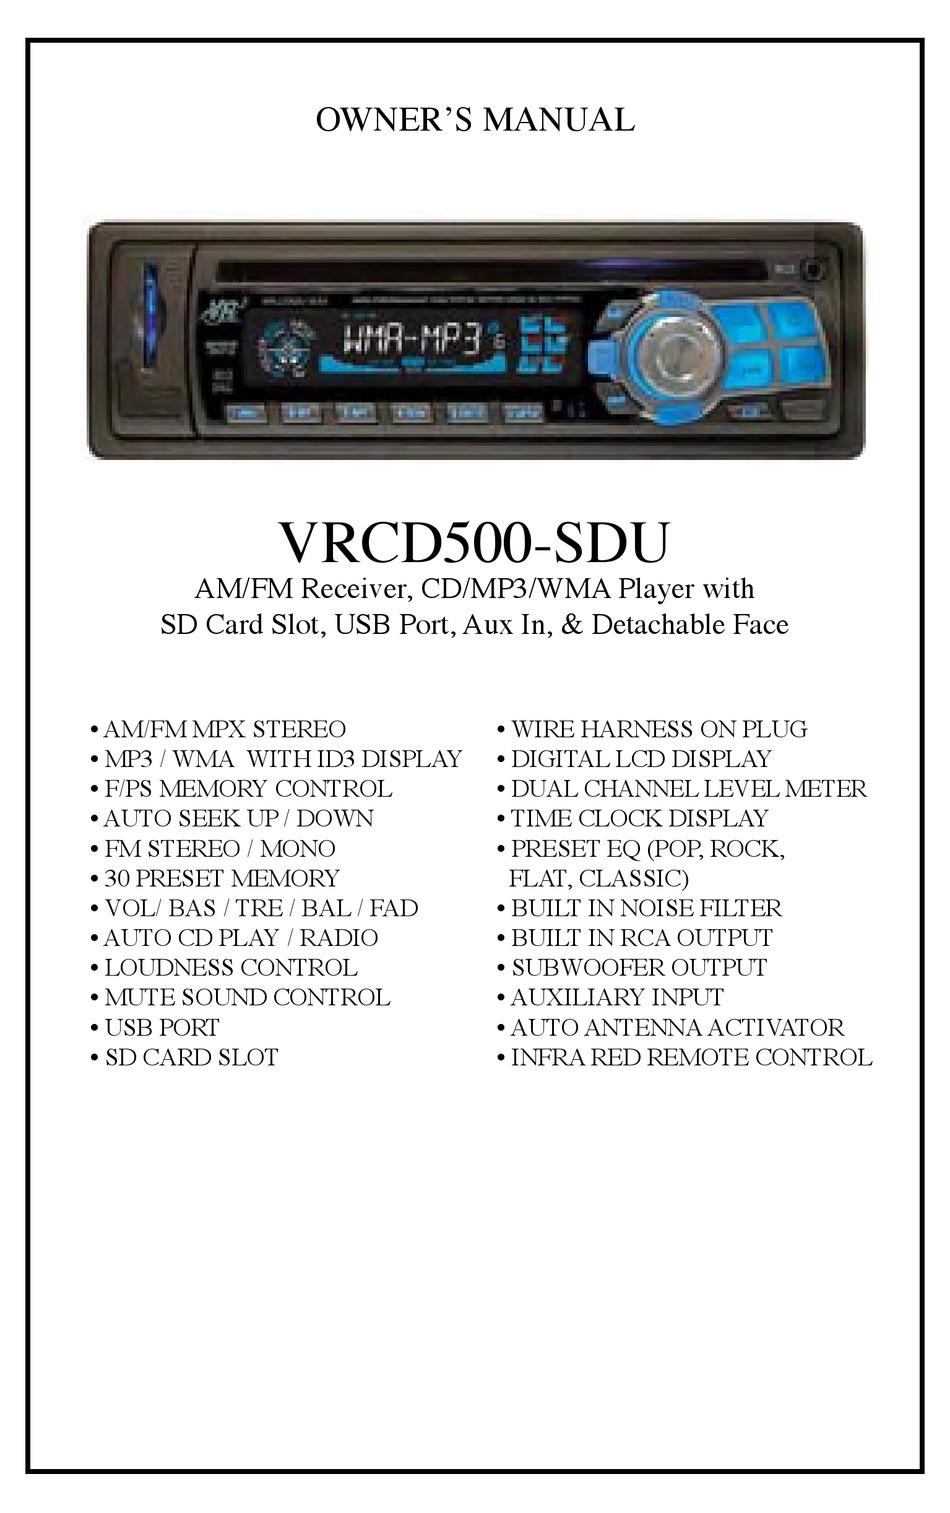 VIRTUAL REALITY VRCD500-SDU OWNER'S MANUAL Pdf Download   ManualsLib   Vr500cs Bt Wiring Harness      ManualsLib